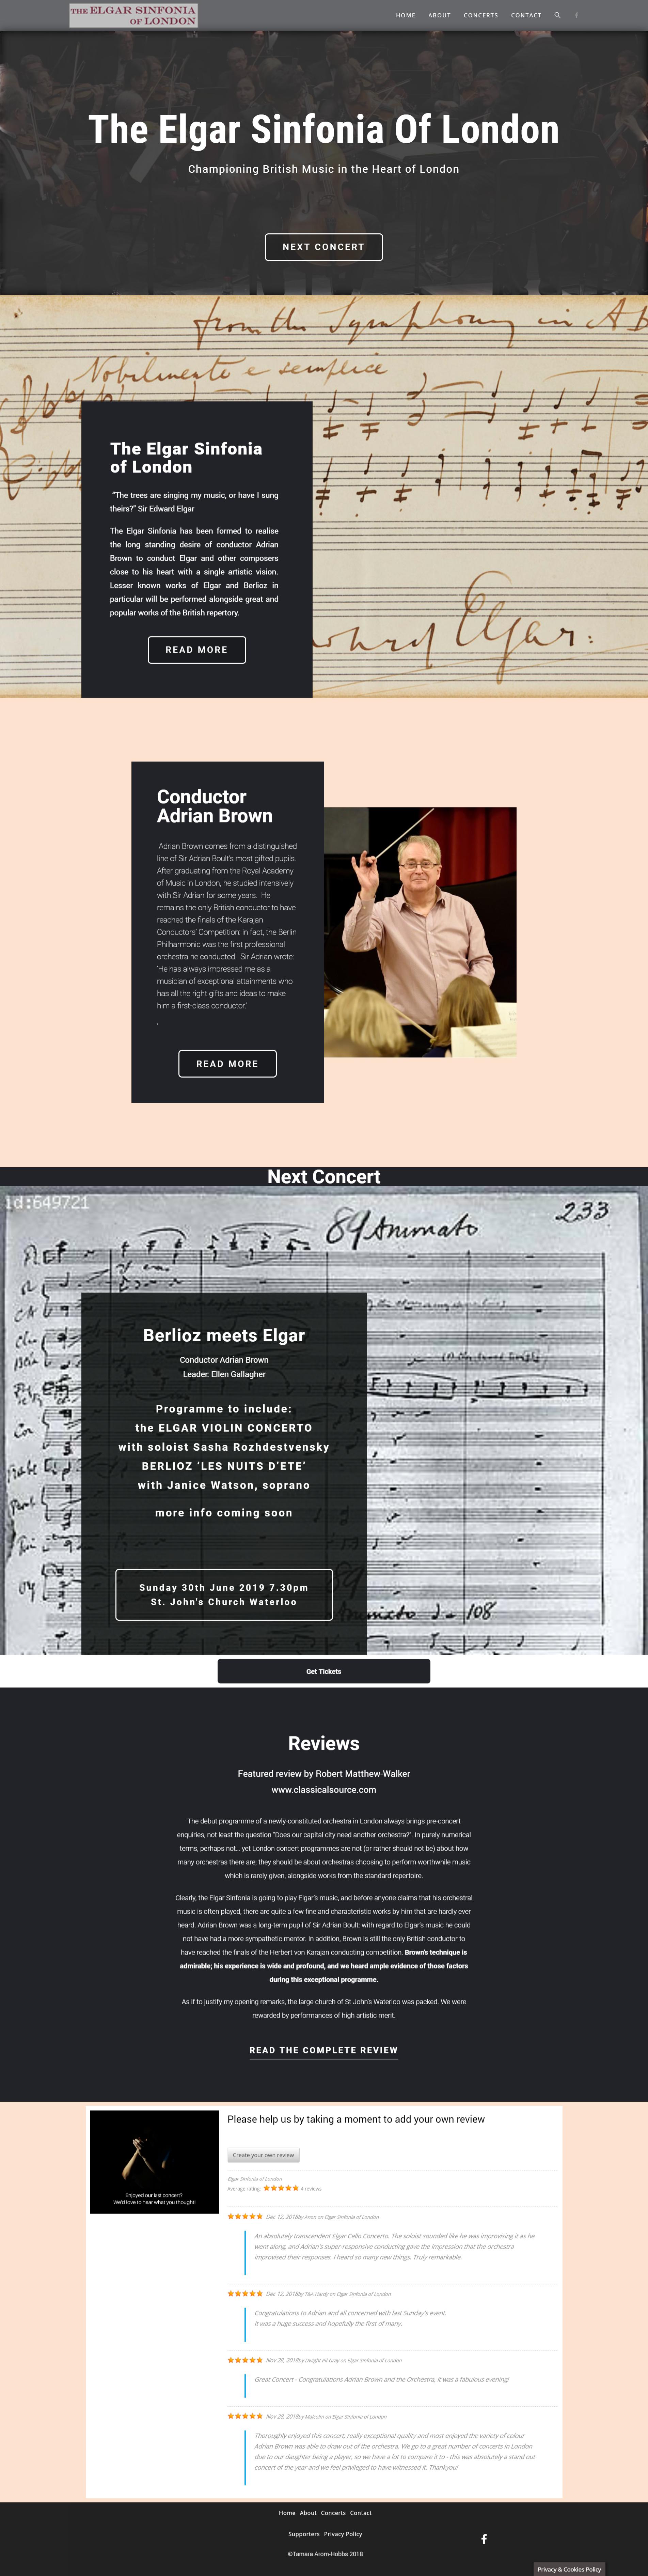 Elgar Sinfonia of London by Lightpresence Webdesign